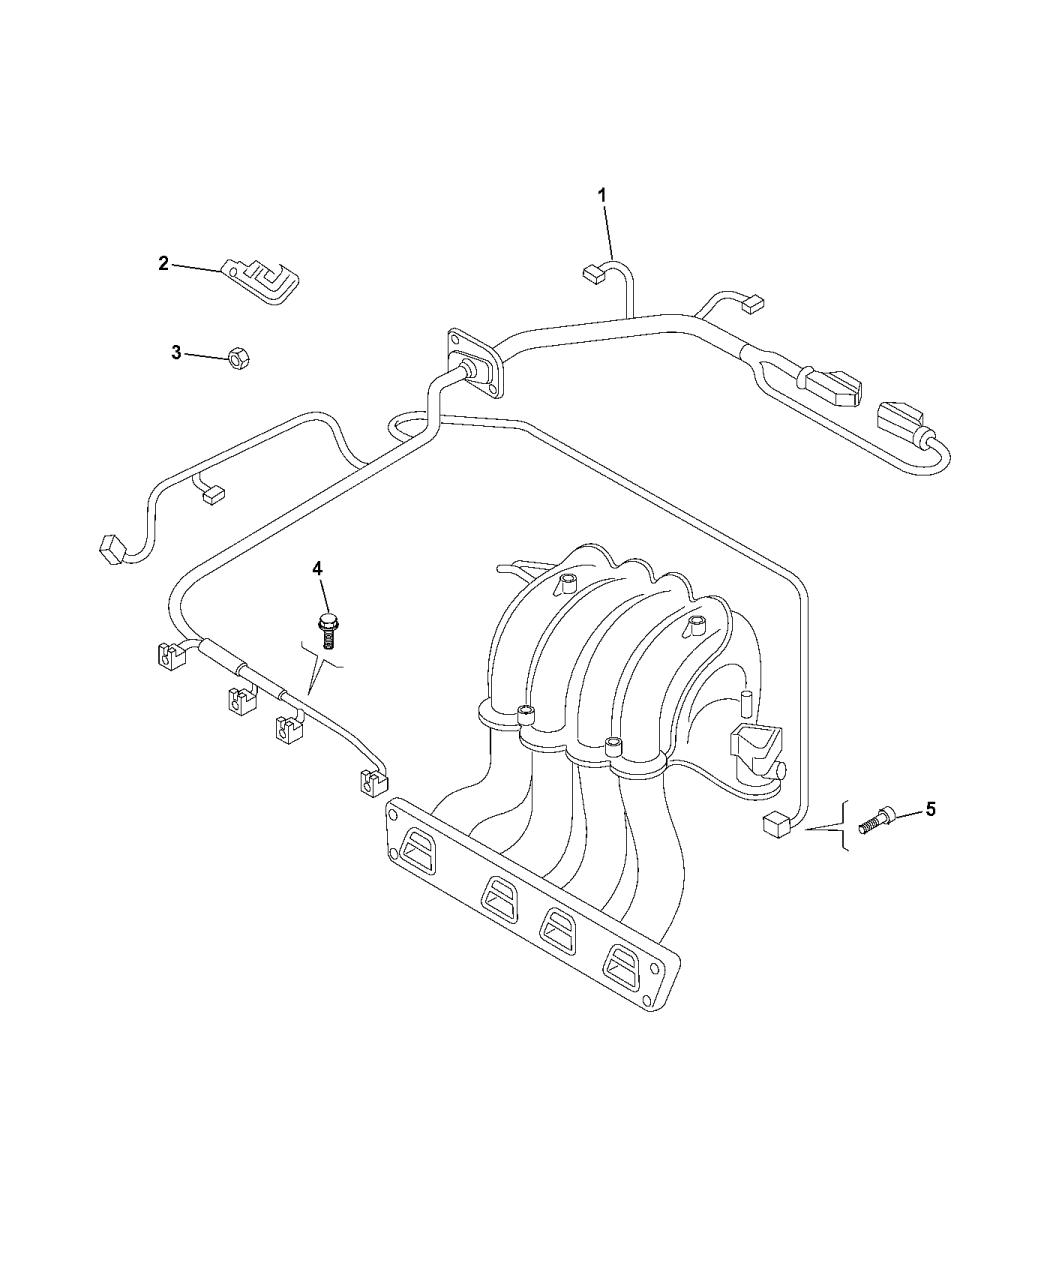 2015 Jeep Renegade Wiring - Engine - Mopar Parts Giant Jeep Renegade Wiring Harness Diagram on jeep wrangler yj wiring diagram, jeep cherokee sport wiring diagram, jeep hurricane wiring diagram, jeep commander wiring diagram, jeep cj wiring diagram, jeep wagoneer wiring diagram,